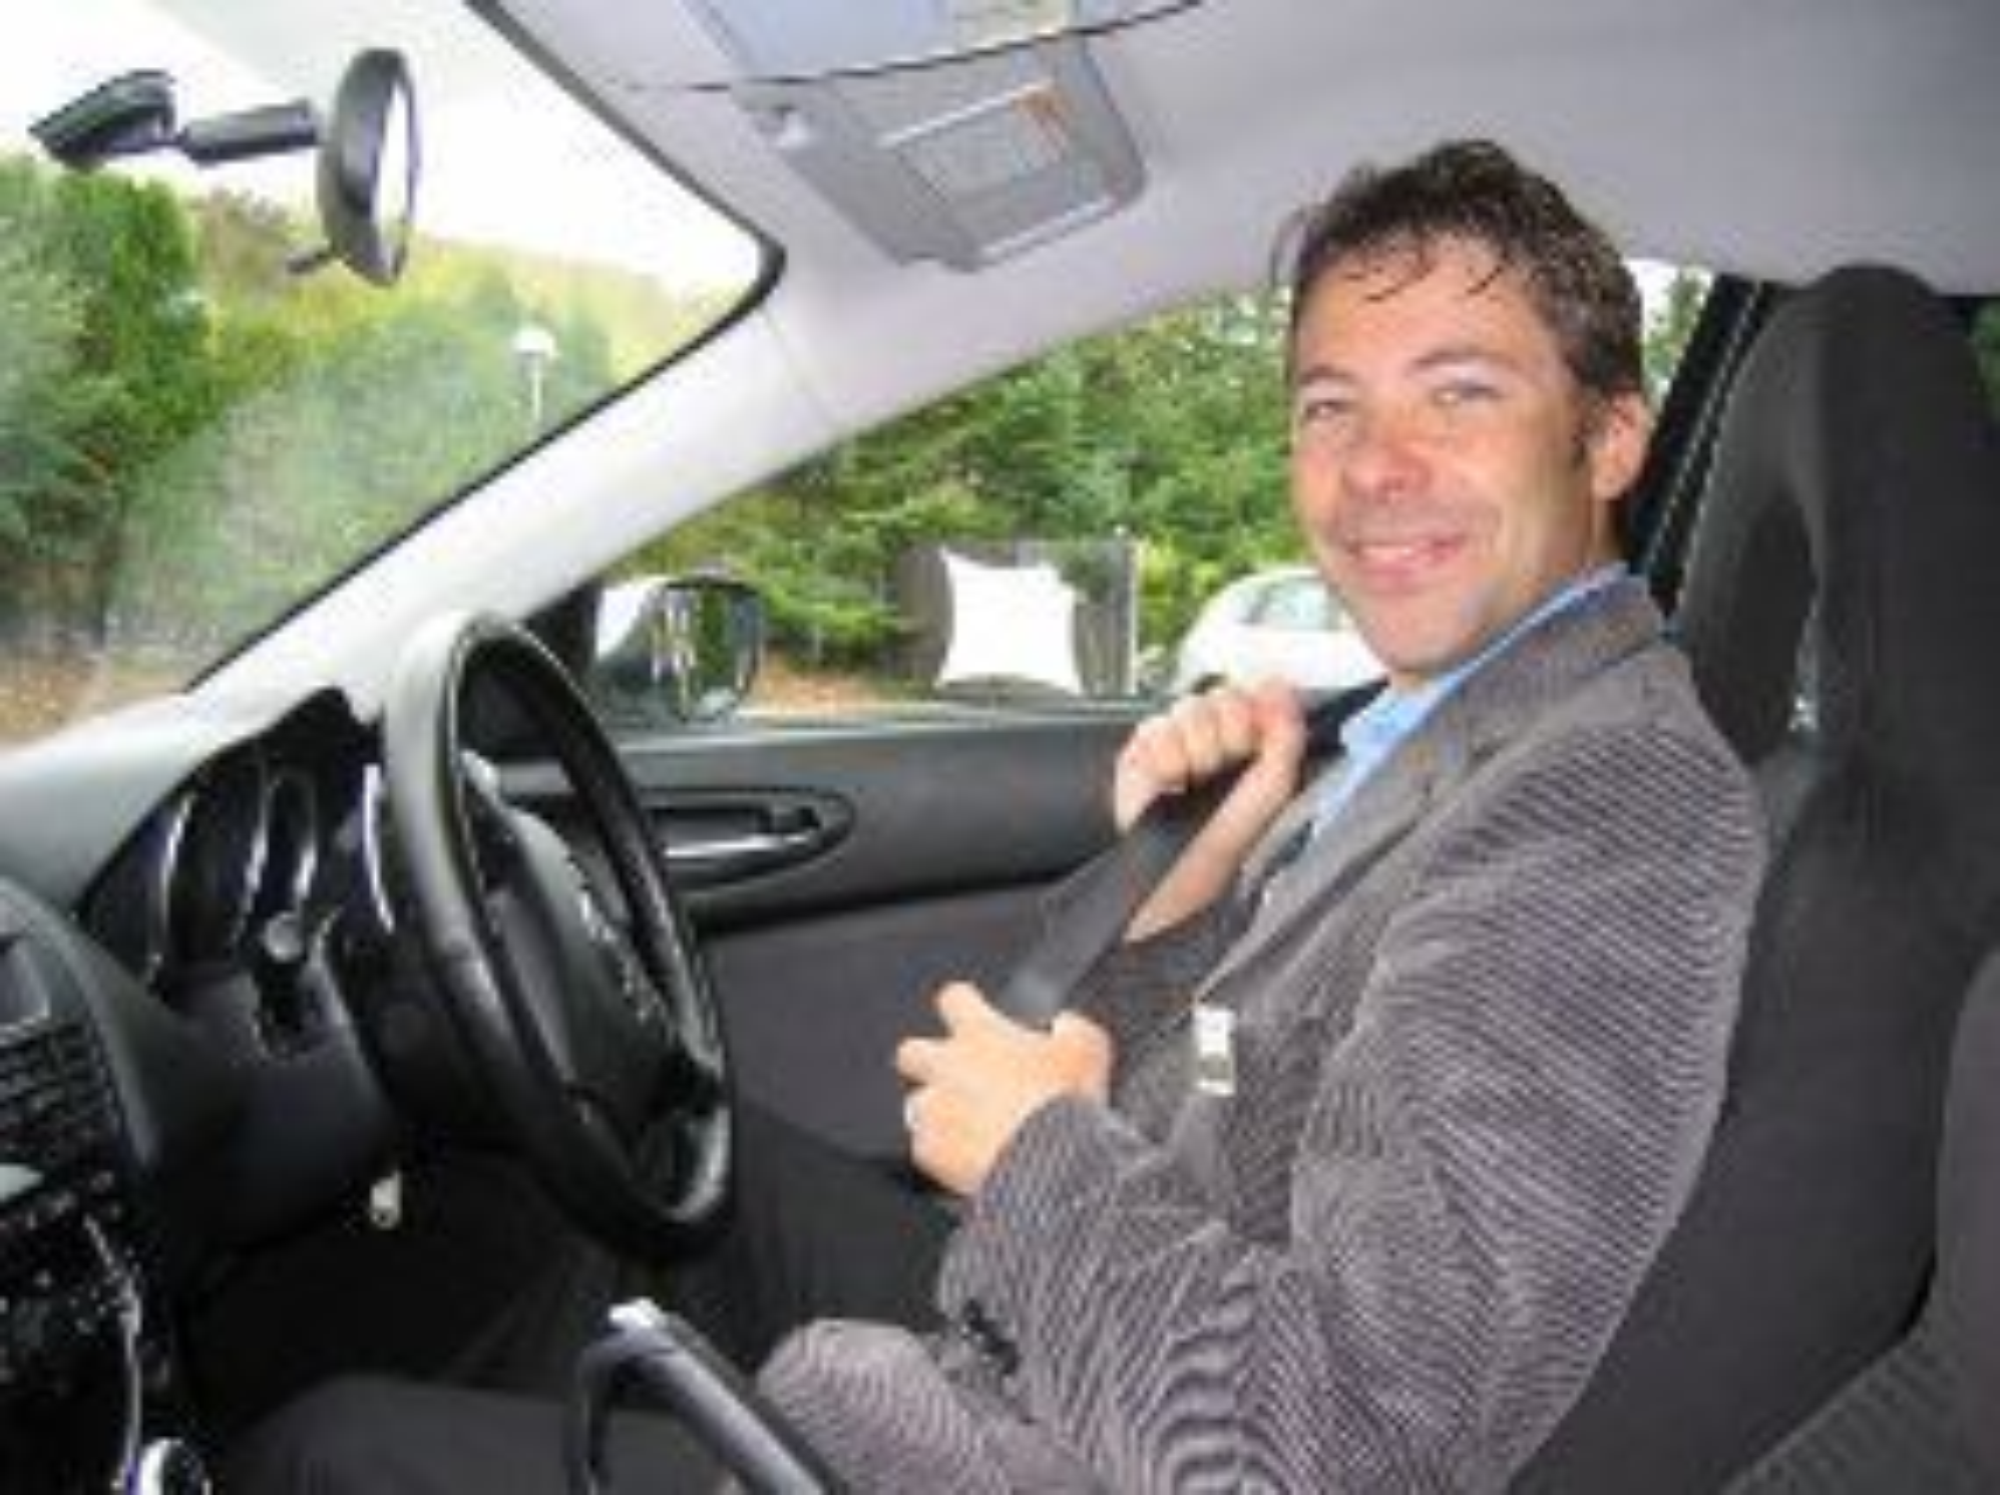 Steffen Møller-Holst